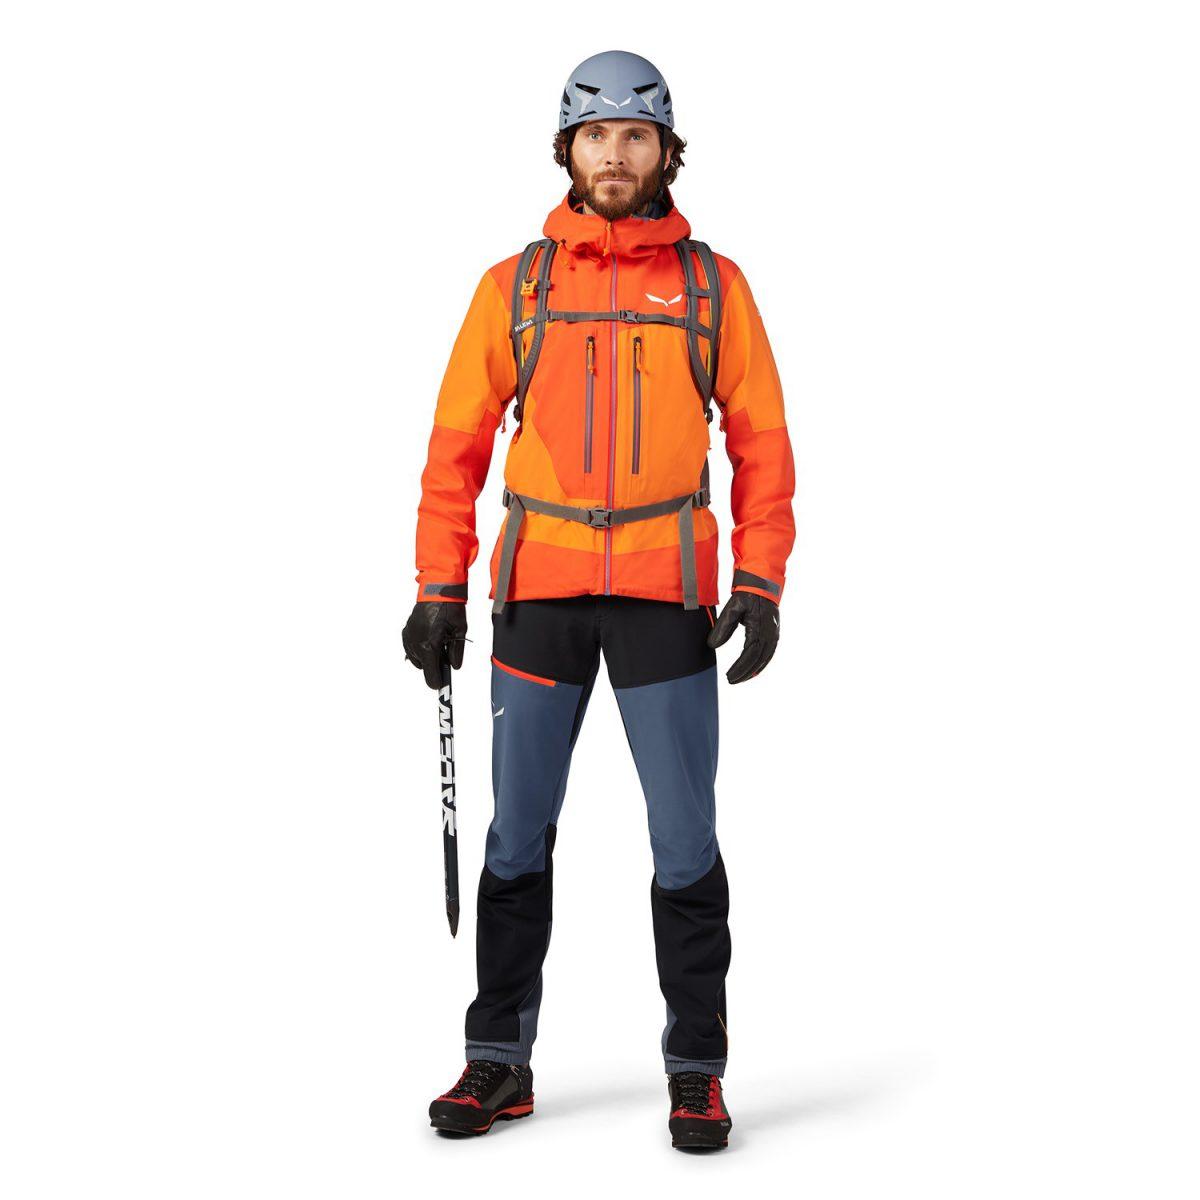 ORTLES 3 GORE-TEX PRO waterproof man jacket orange backpack compatible